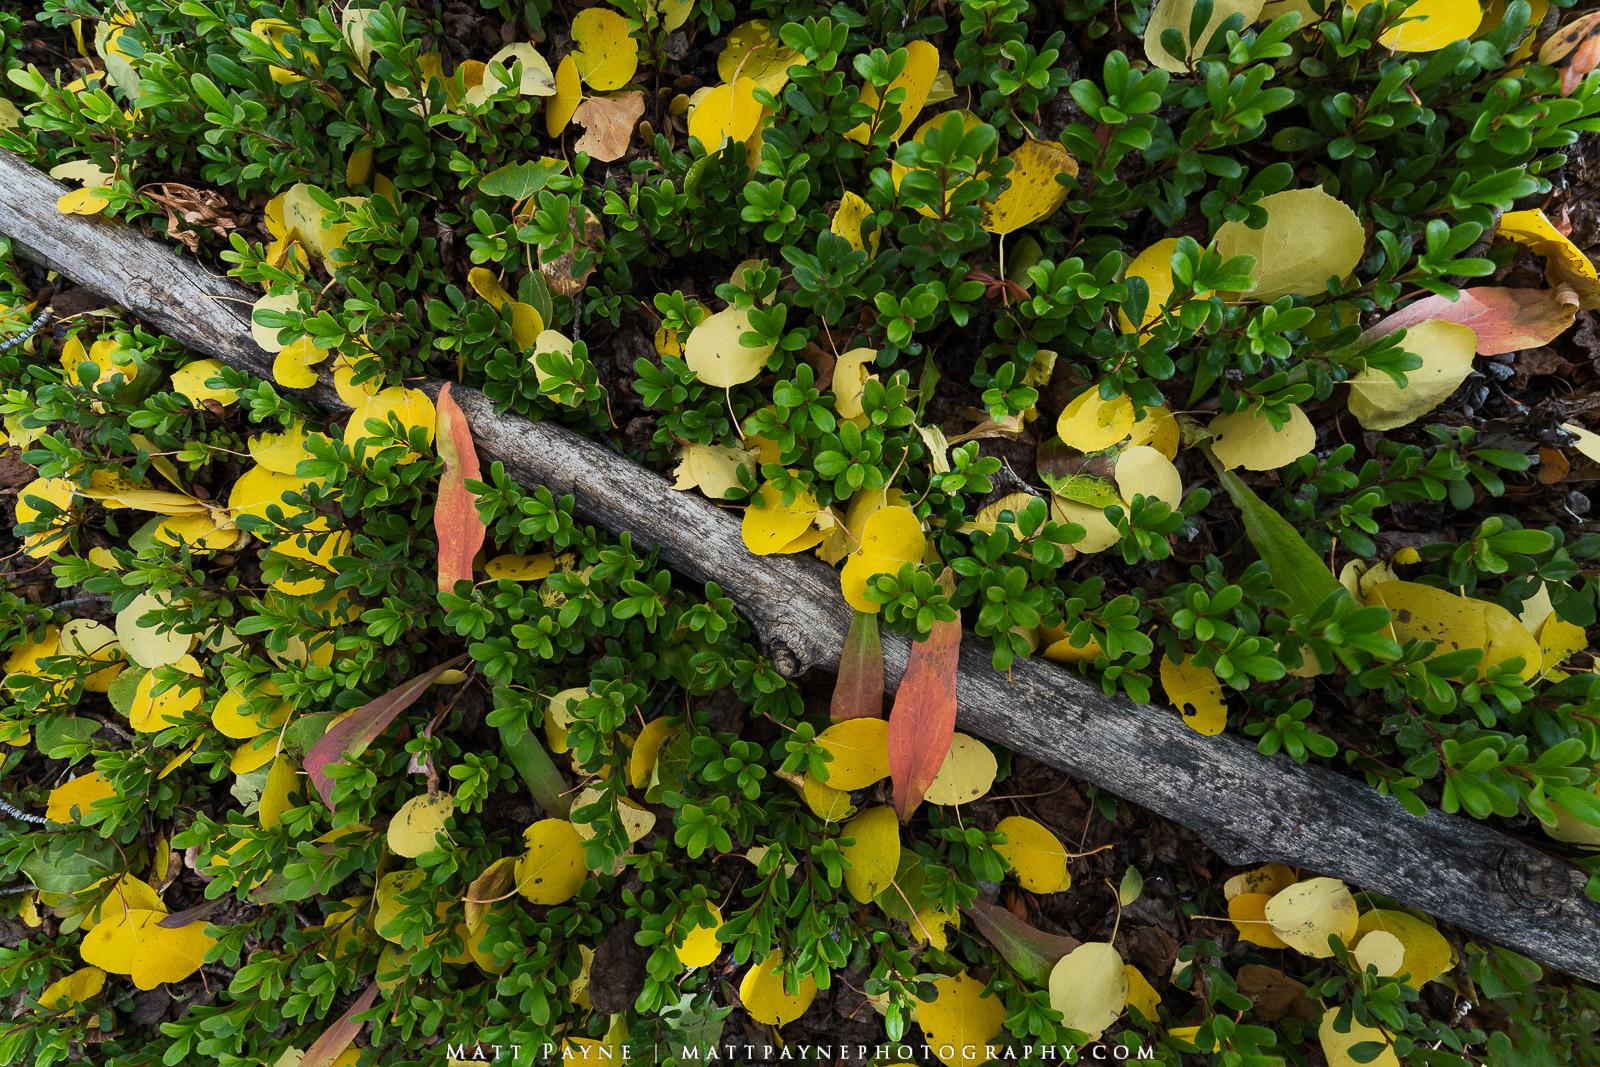 Autumn, Bearberry, Colorado, Fall, Foliage, Kinnikinnick, Leaves, Plants, Landscape Photography, photo